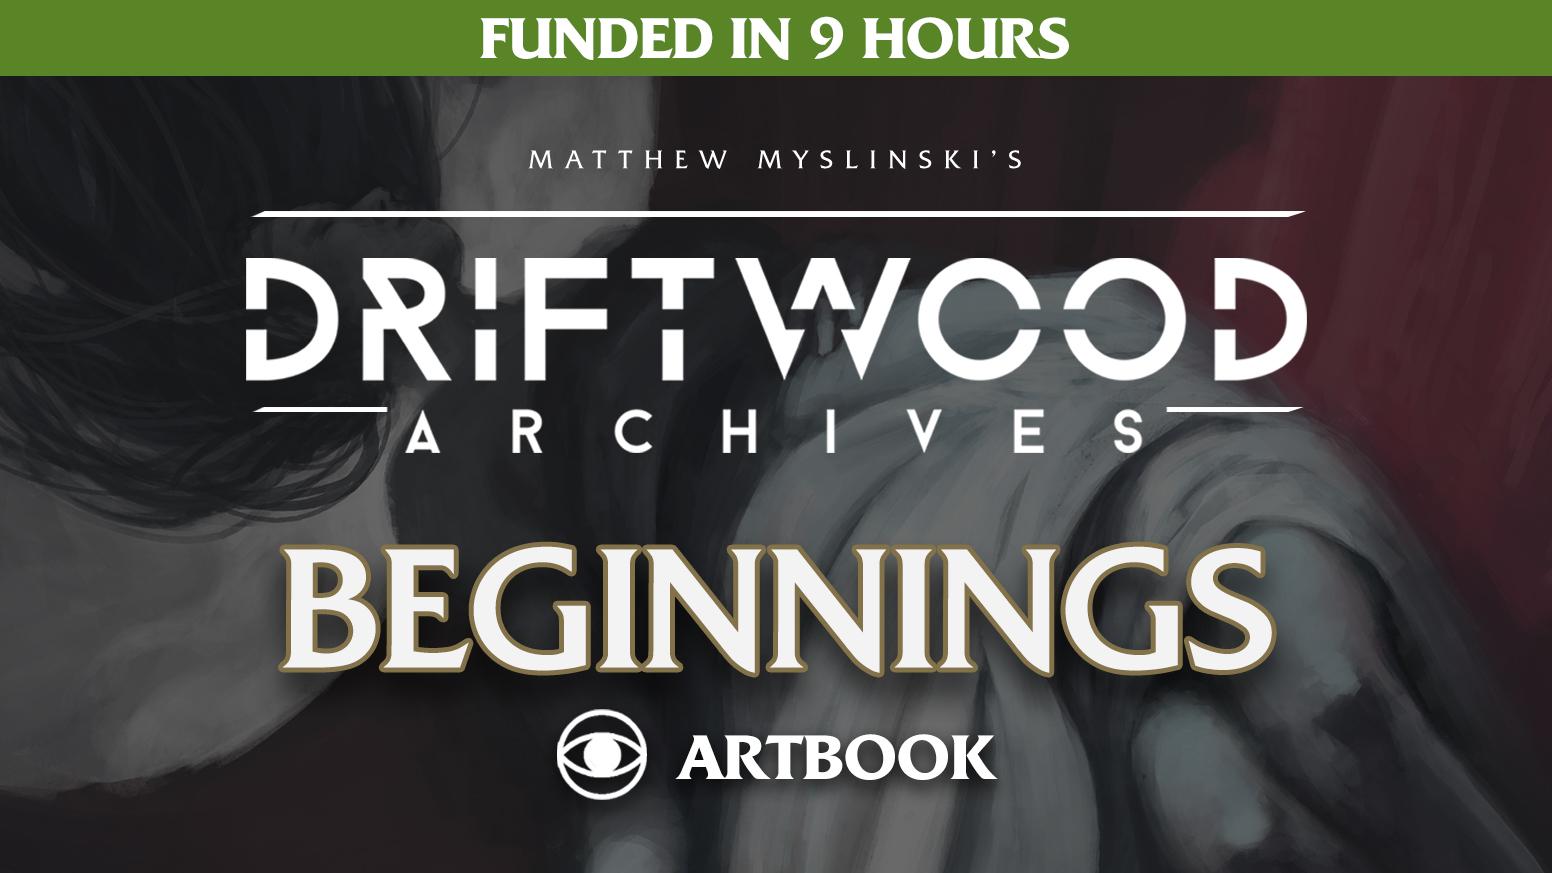 Kickstarter_Main-Image_FUNDED.jpg